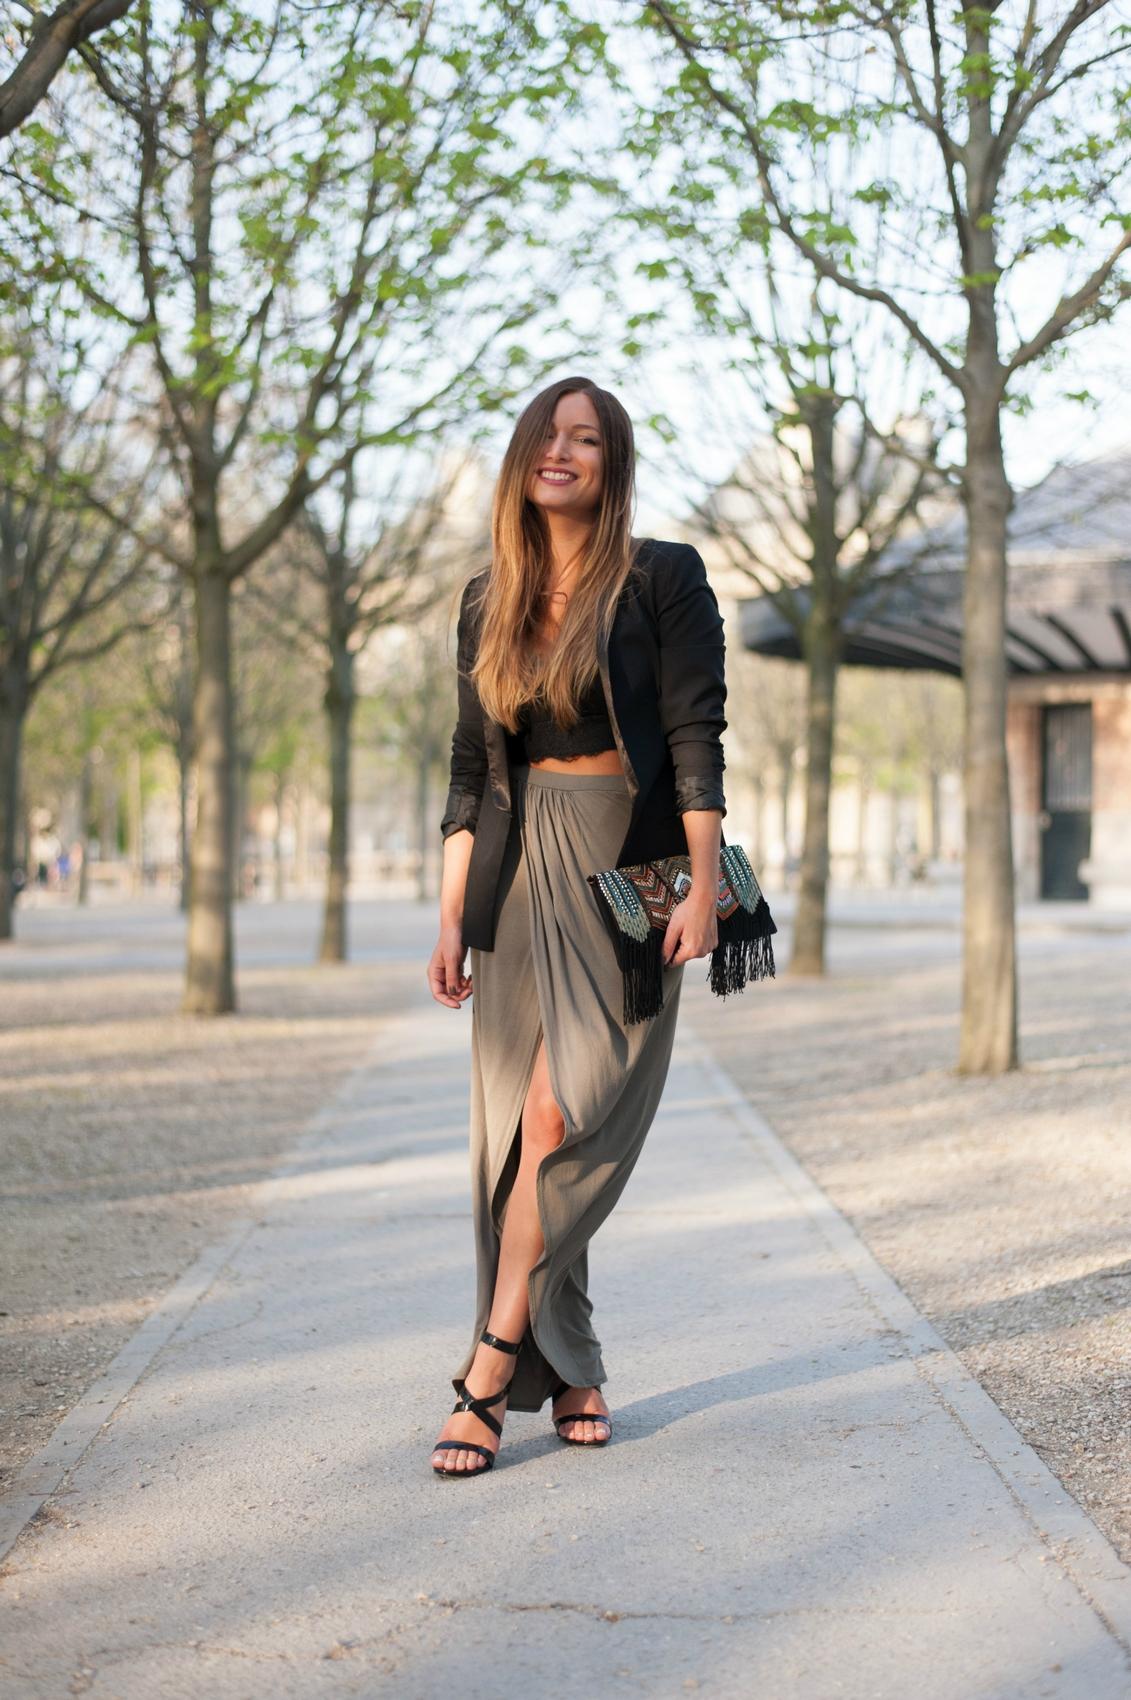 jupe longue kaki blazer noir crop top dentelle